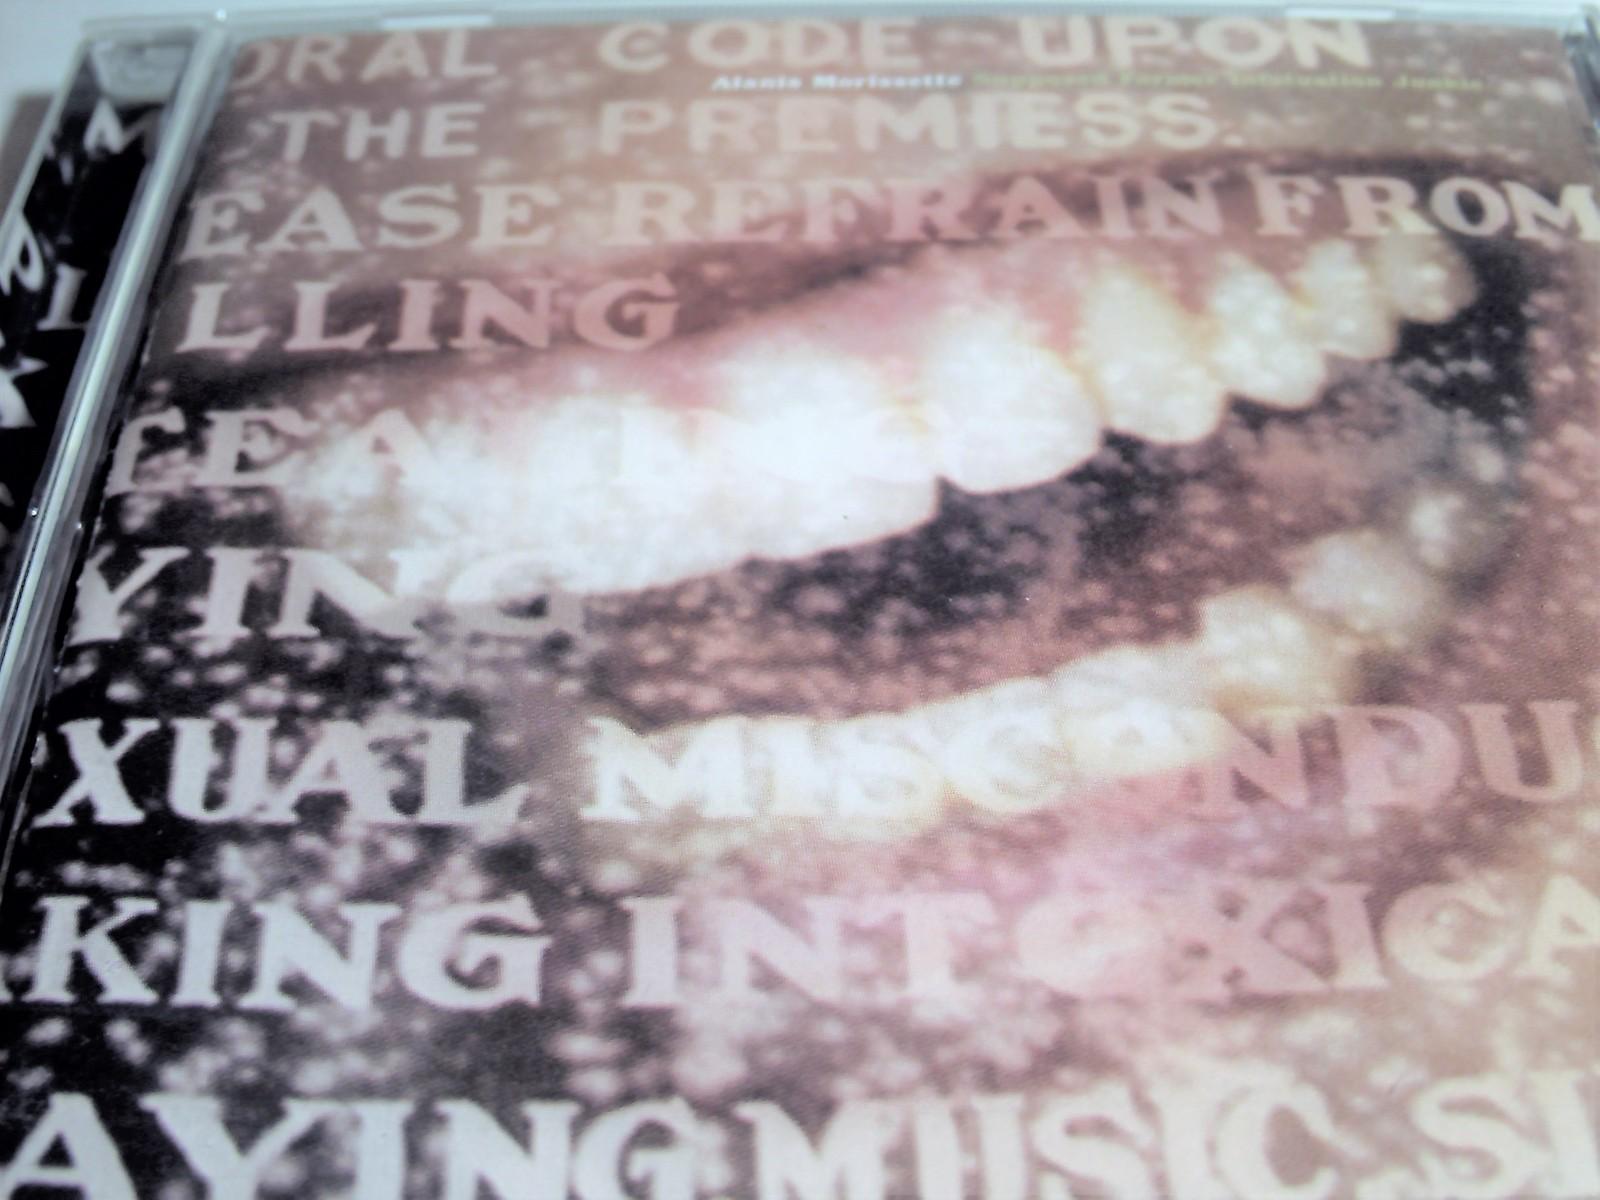 Alanis Morissette Supposed Former Infatuation Junkie CD